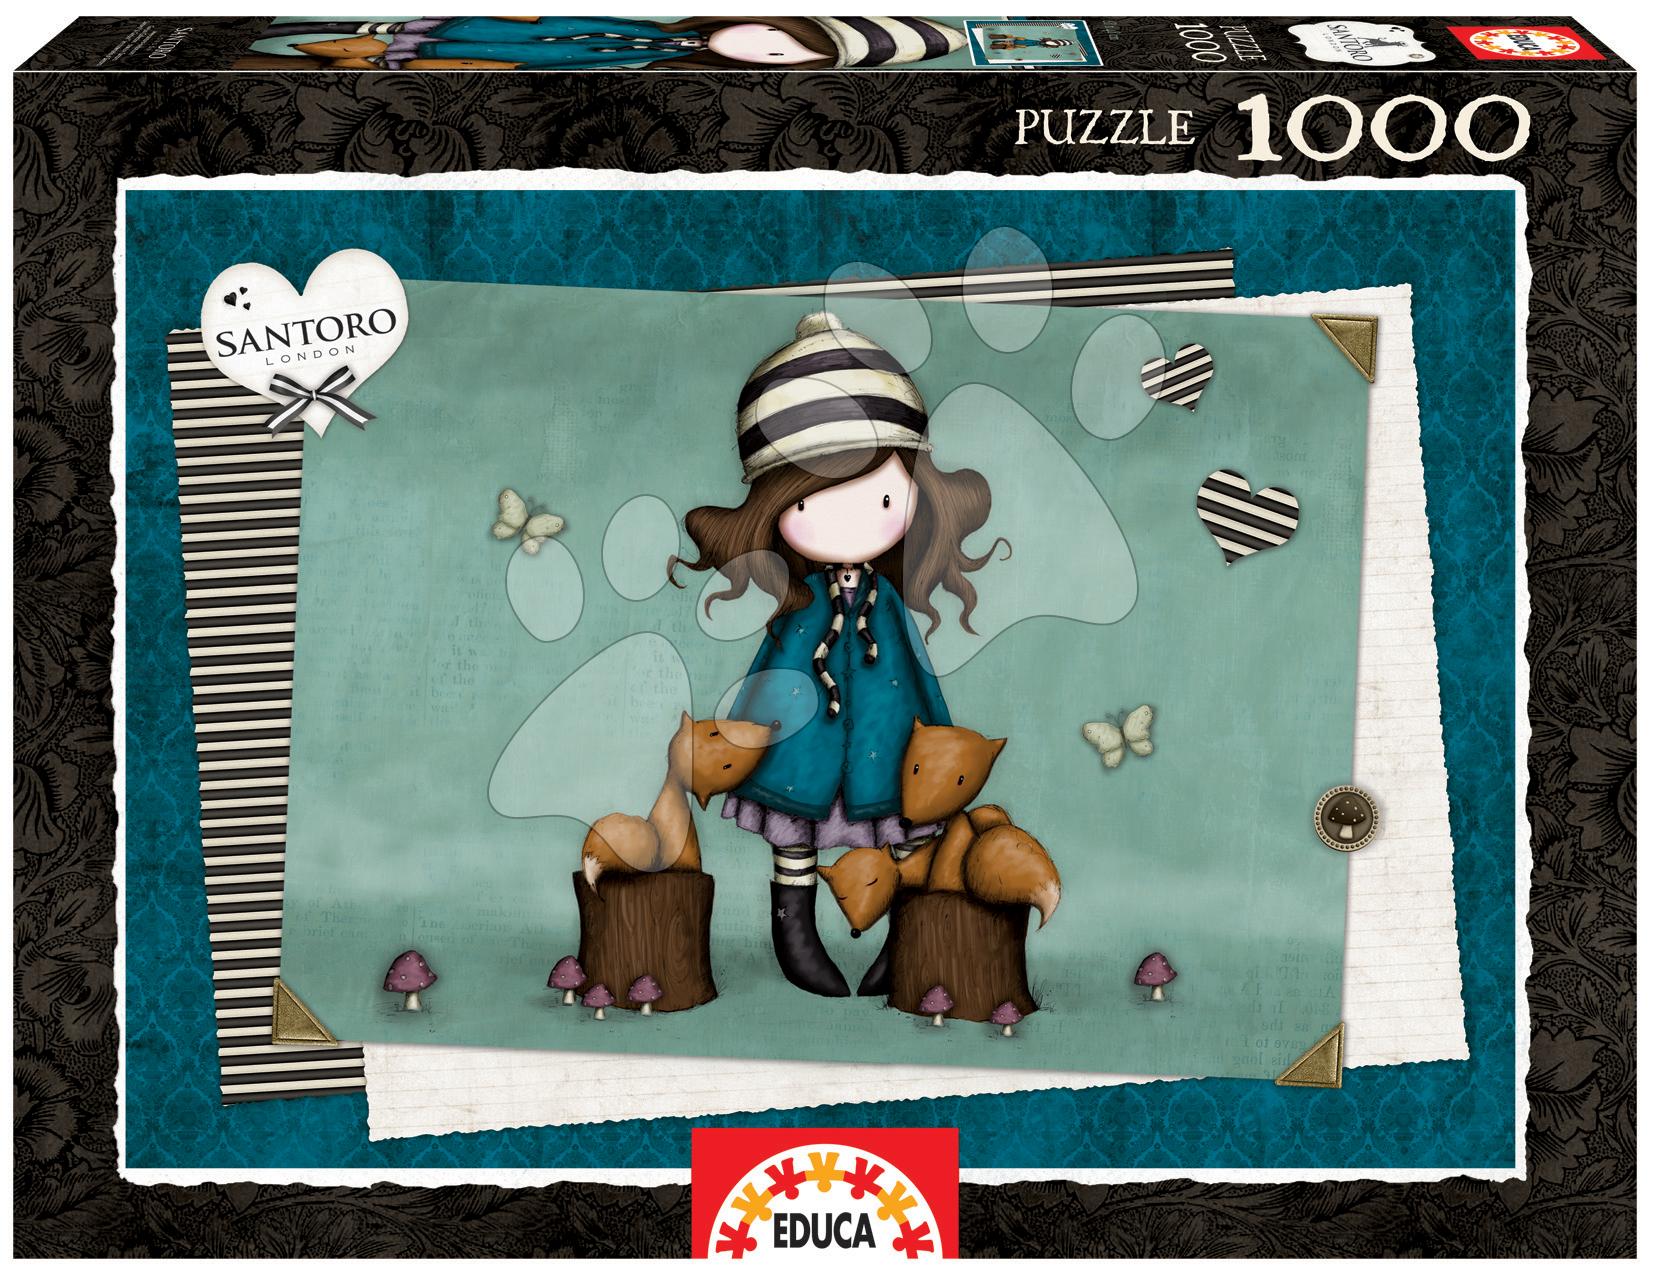 Puzzle 1000 dielne - Puzzle Santoro Gorjuss The foxes Educa 1000 dielov od 12 rokov